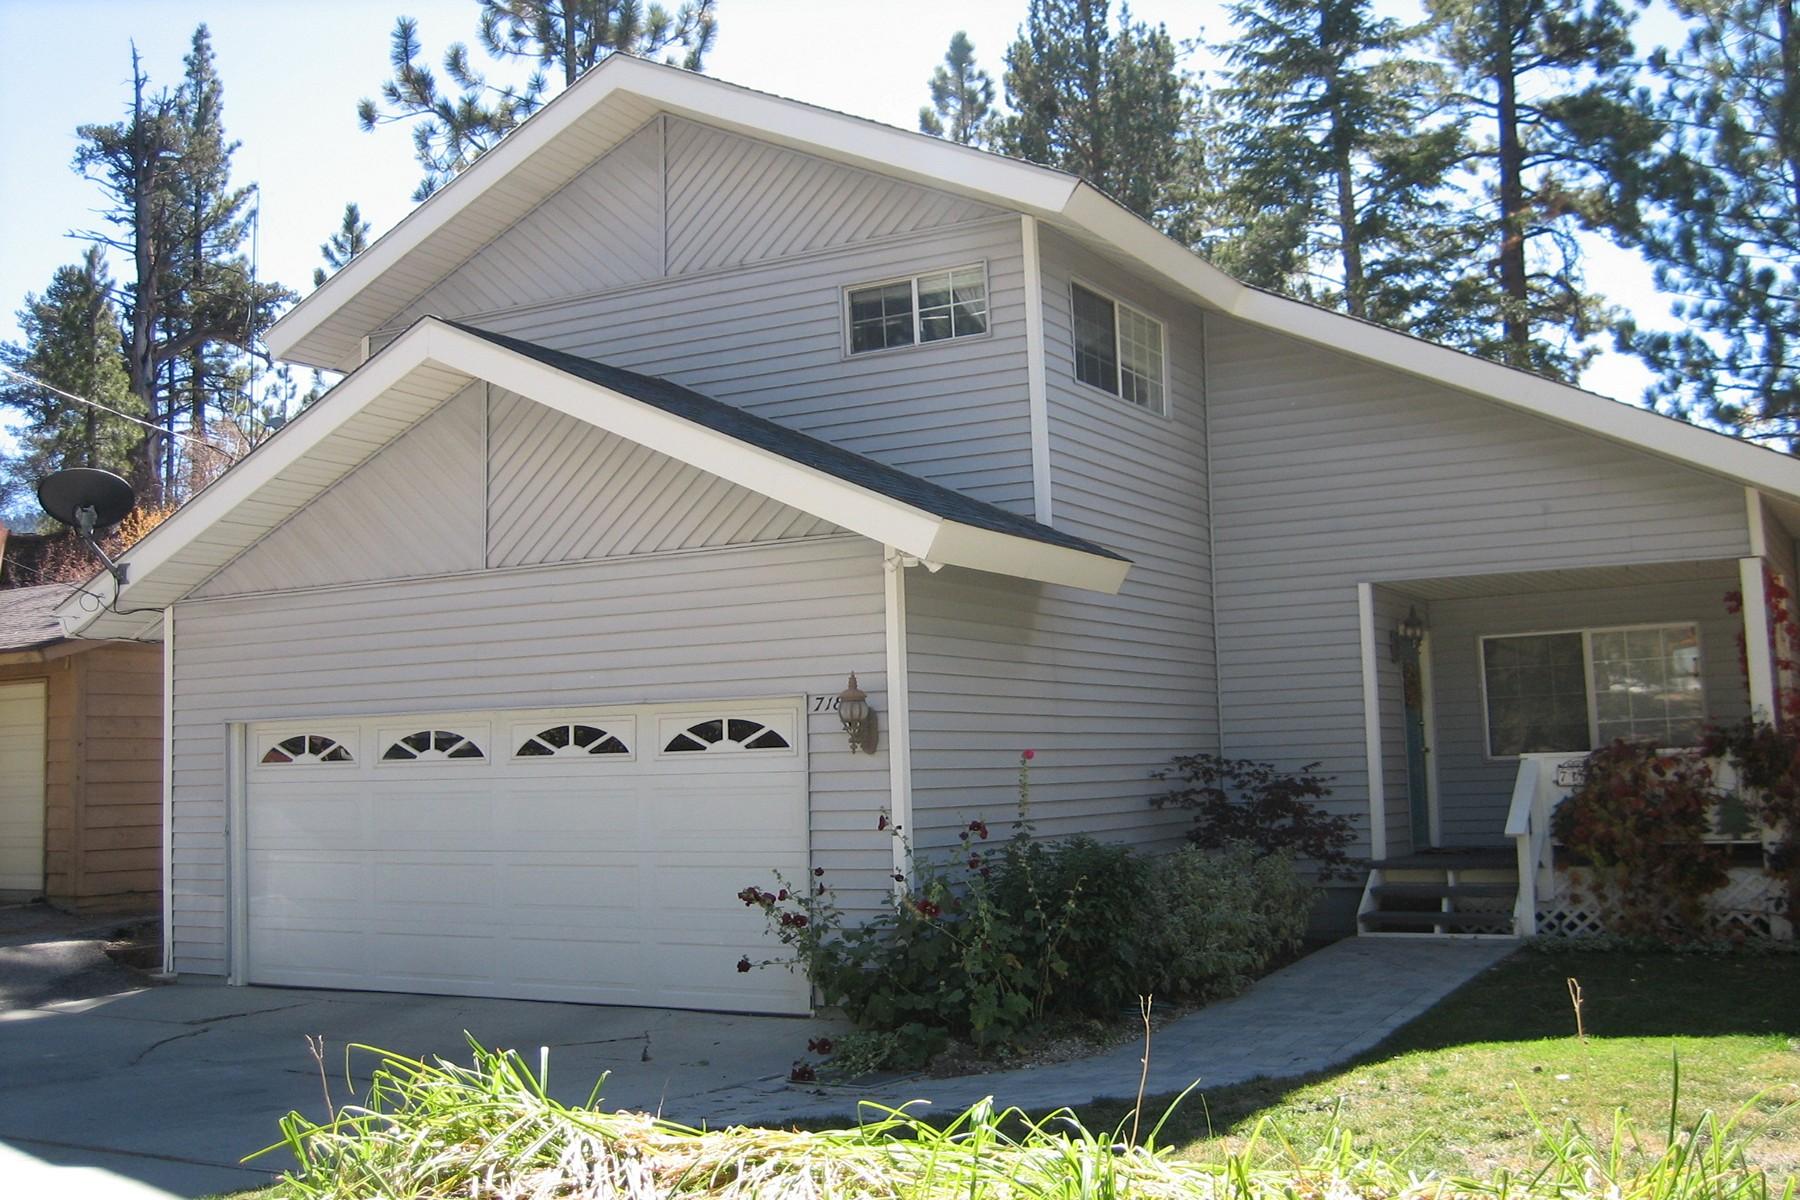 Villa per Vendita alle ore 718 Tehama 718 Tehama Dr Big Bear Lake, California, 92315 Stati Uniti